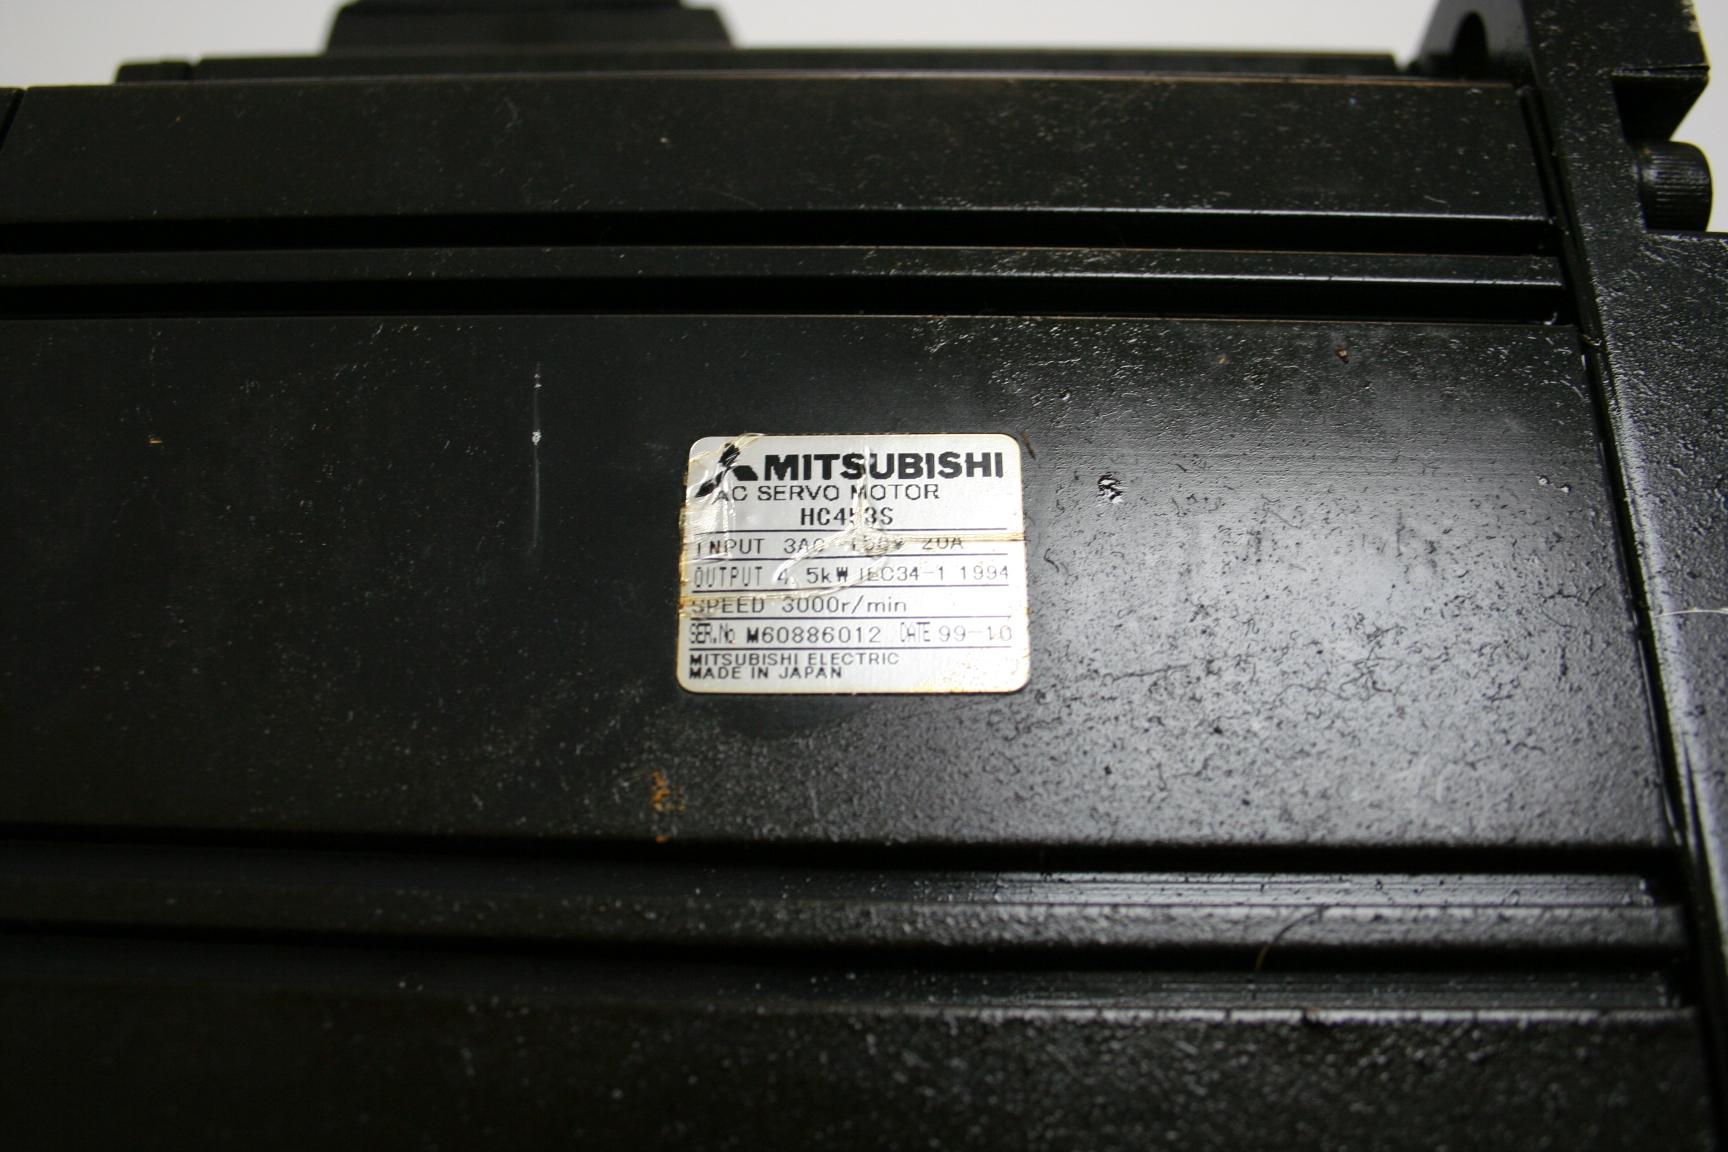 Mazak Mitsubishi HC453S Servo Motor and Encoder (OSE105S2) B